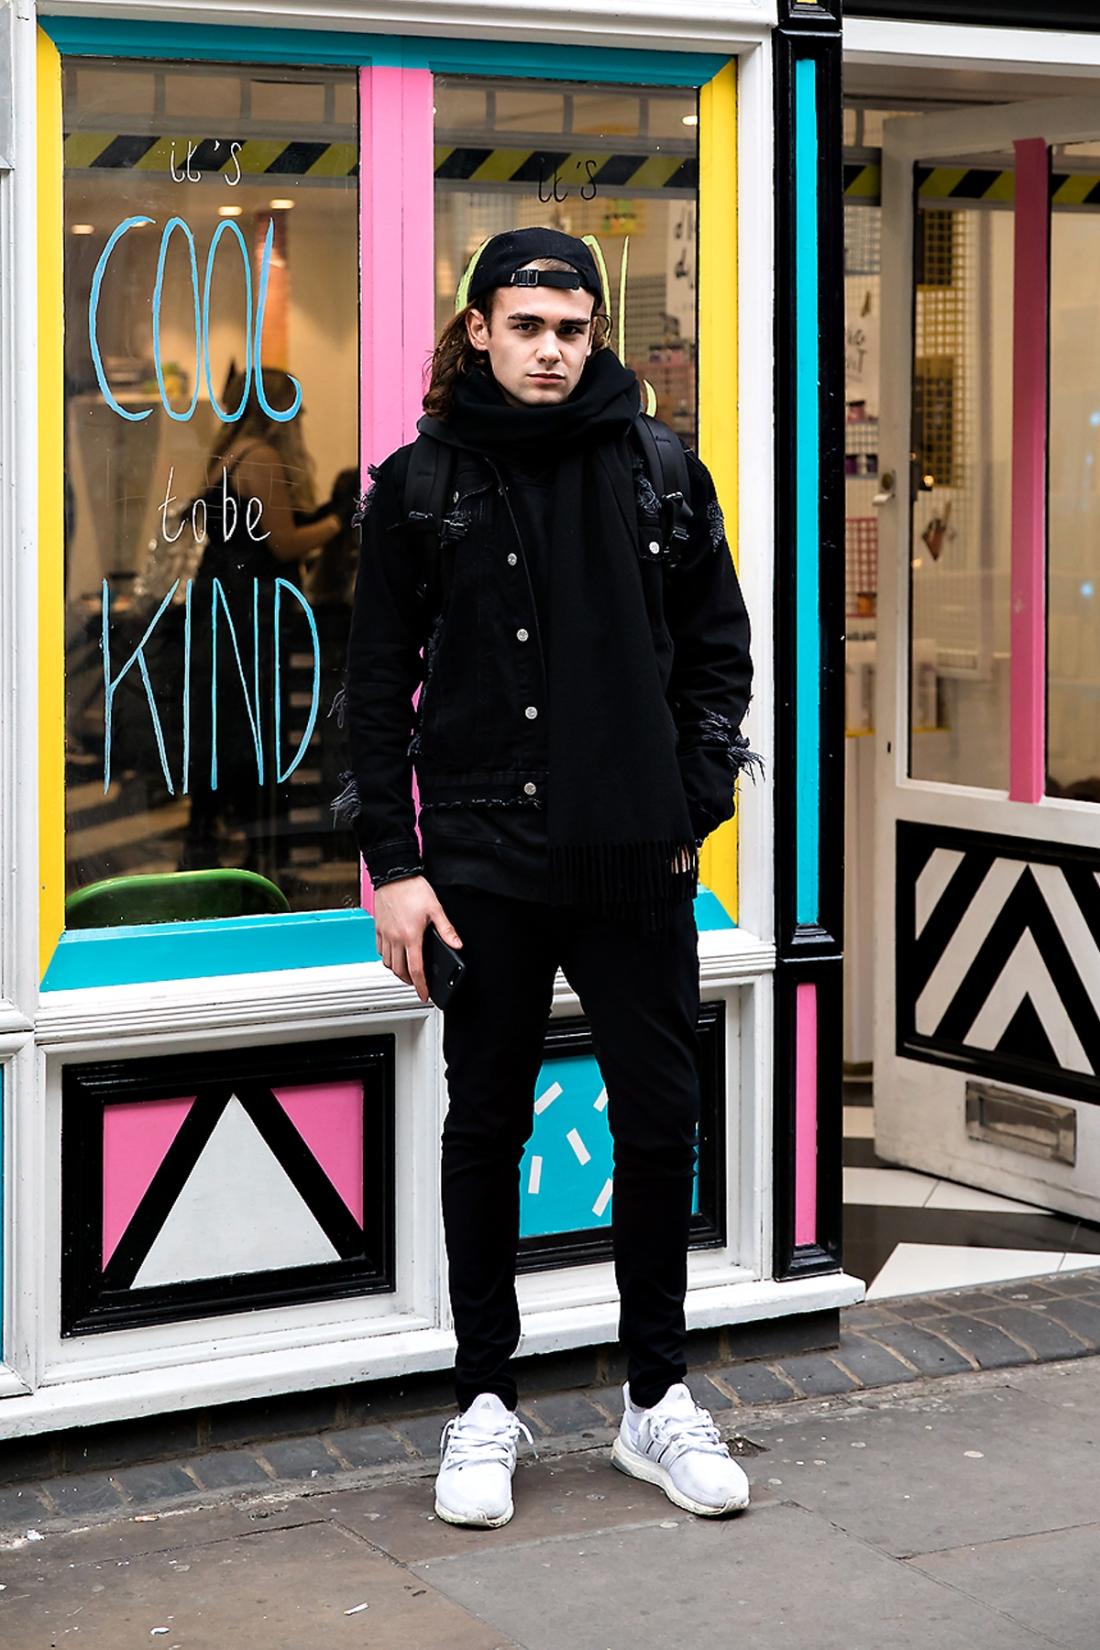 Sebastiaan, Street Fashion 2017 in London.jpg